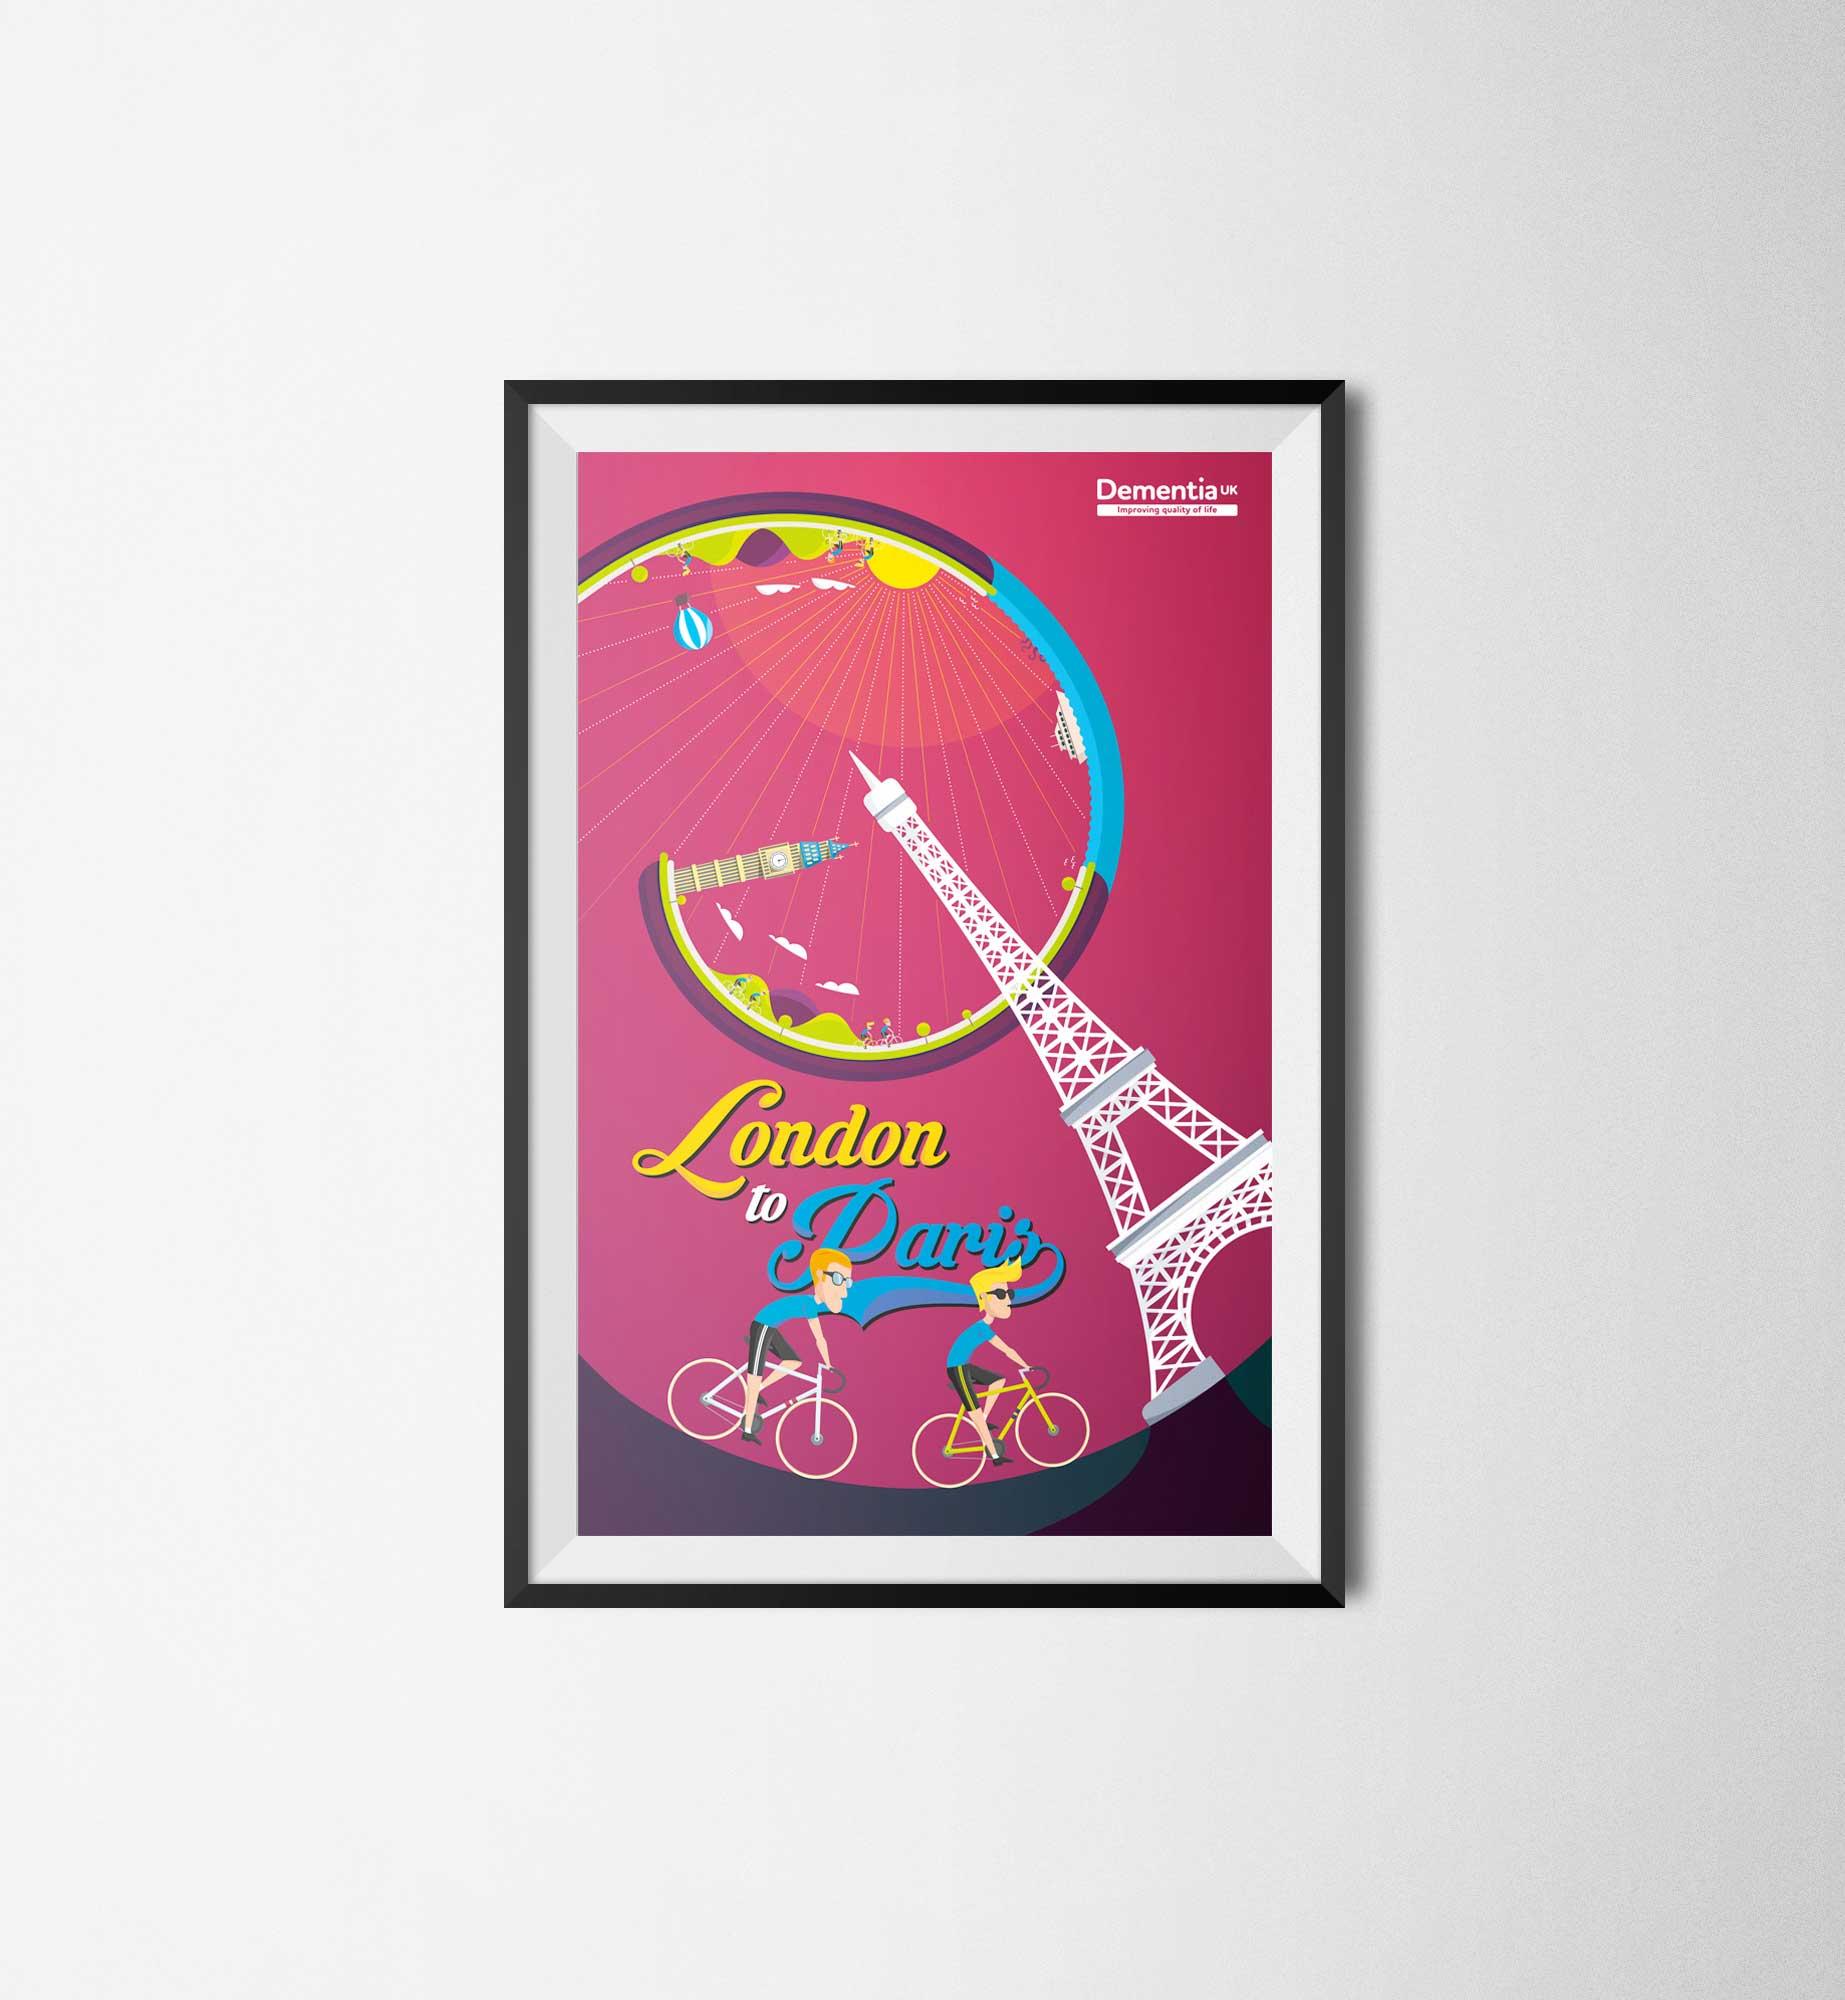 Poster design london - London To Paris Poster Design London To Paris Poster Design 2